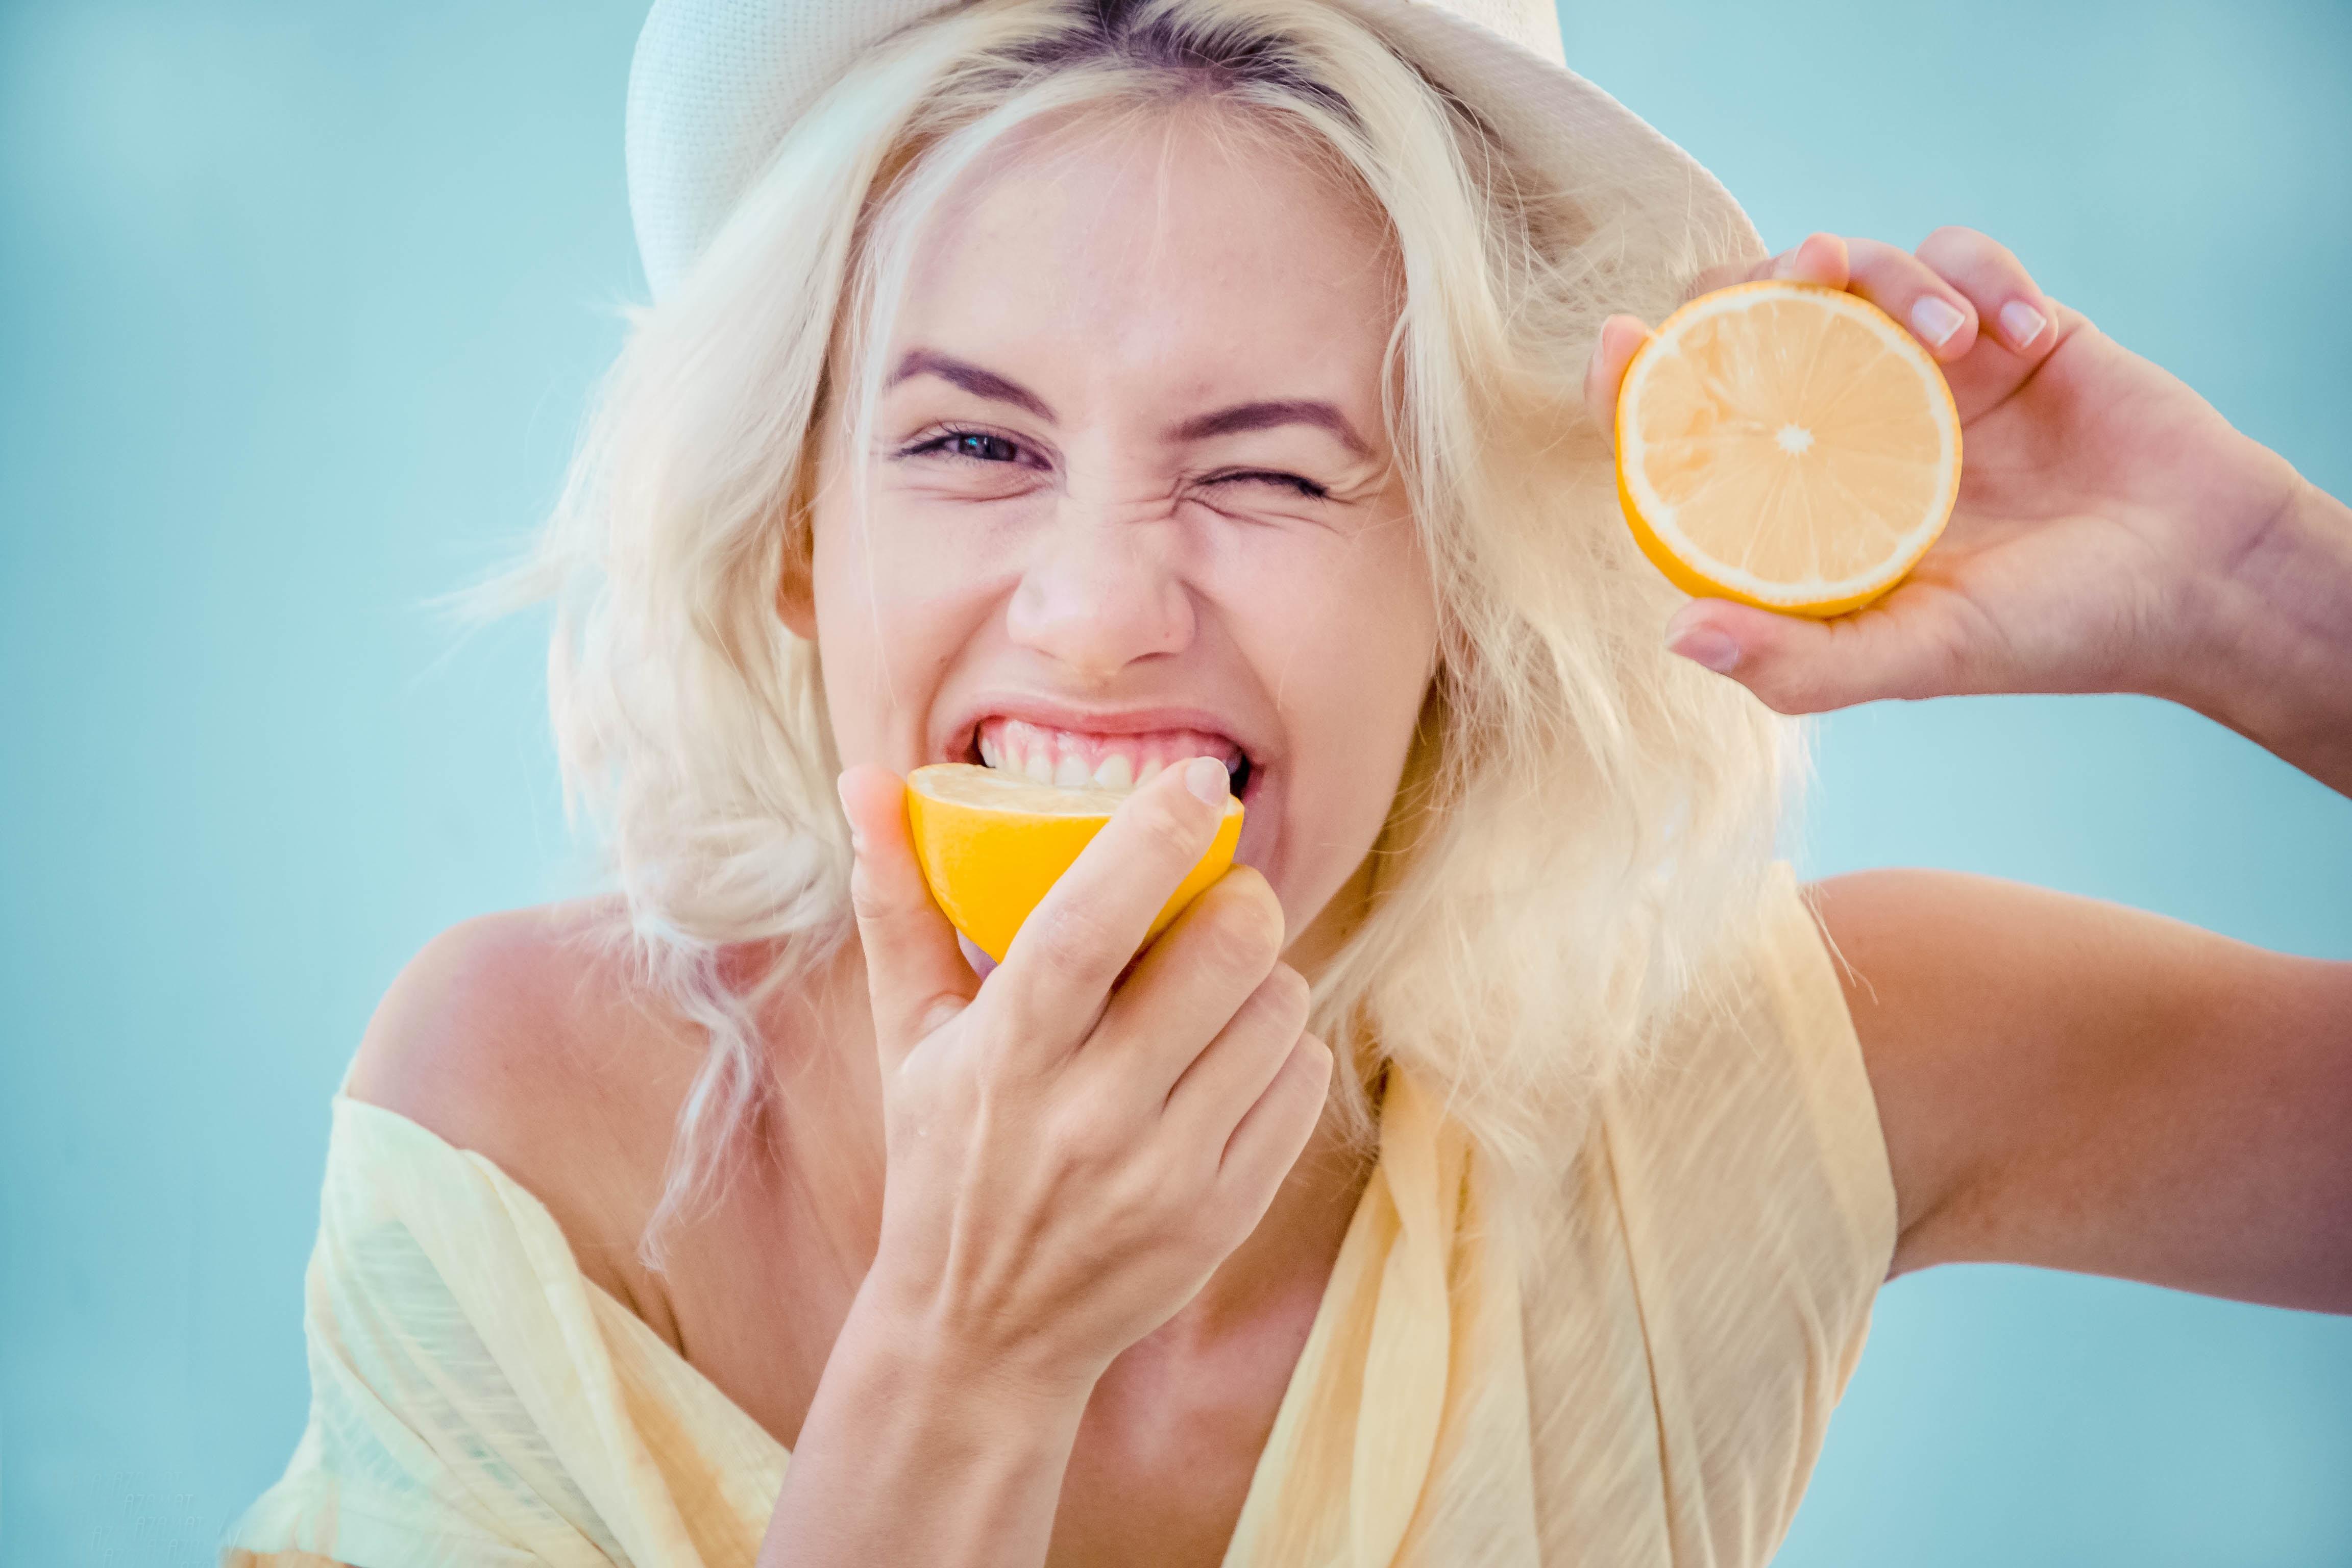 el limon es bueno o malo para la prostata